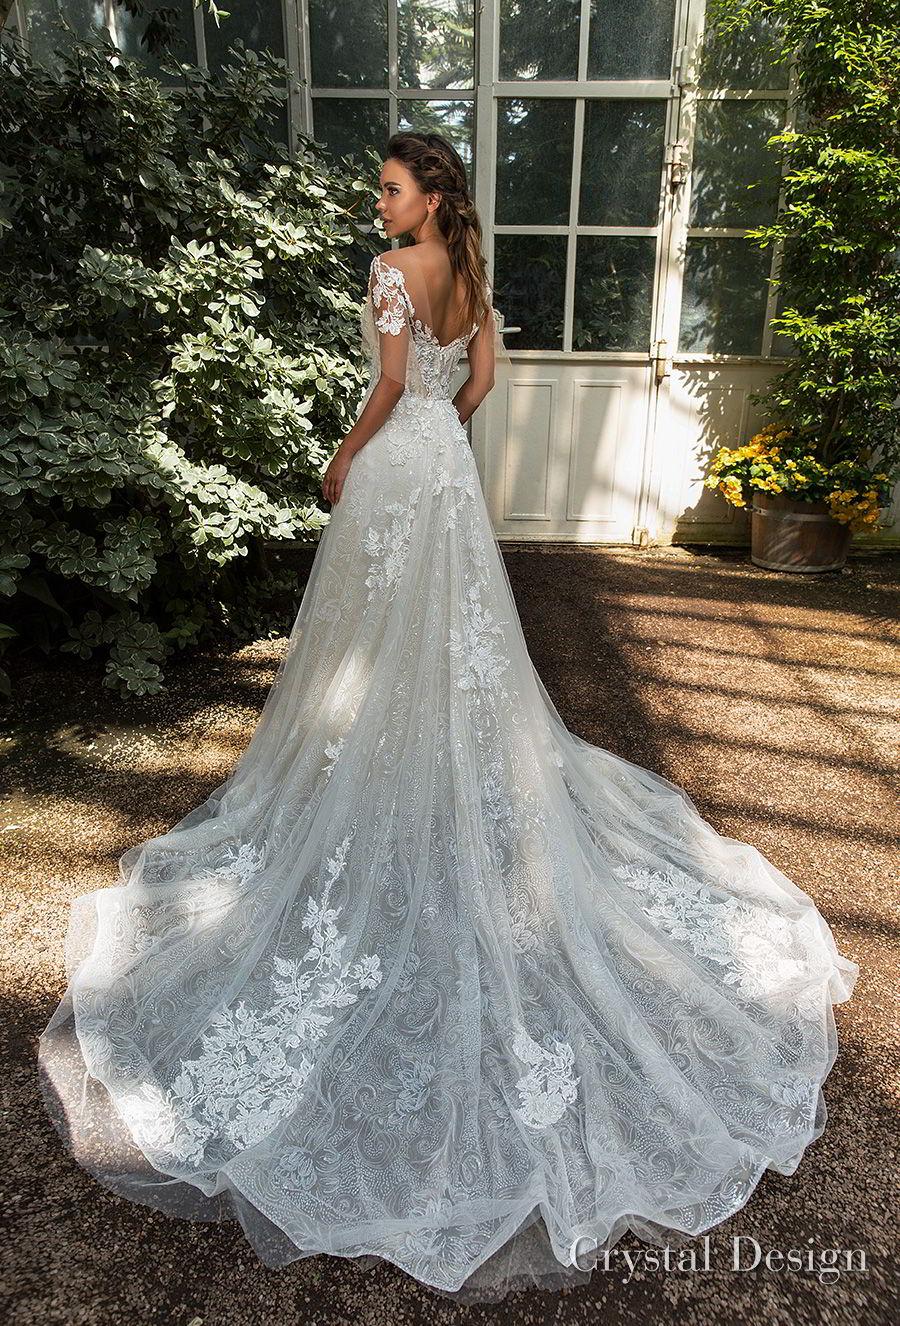 Crystal Design 2018 Wedding Dresses Royal Garden